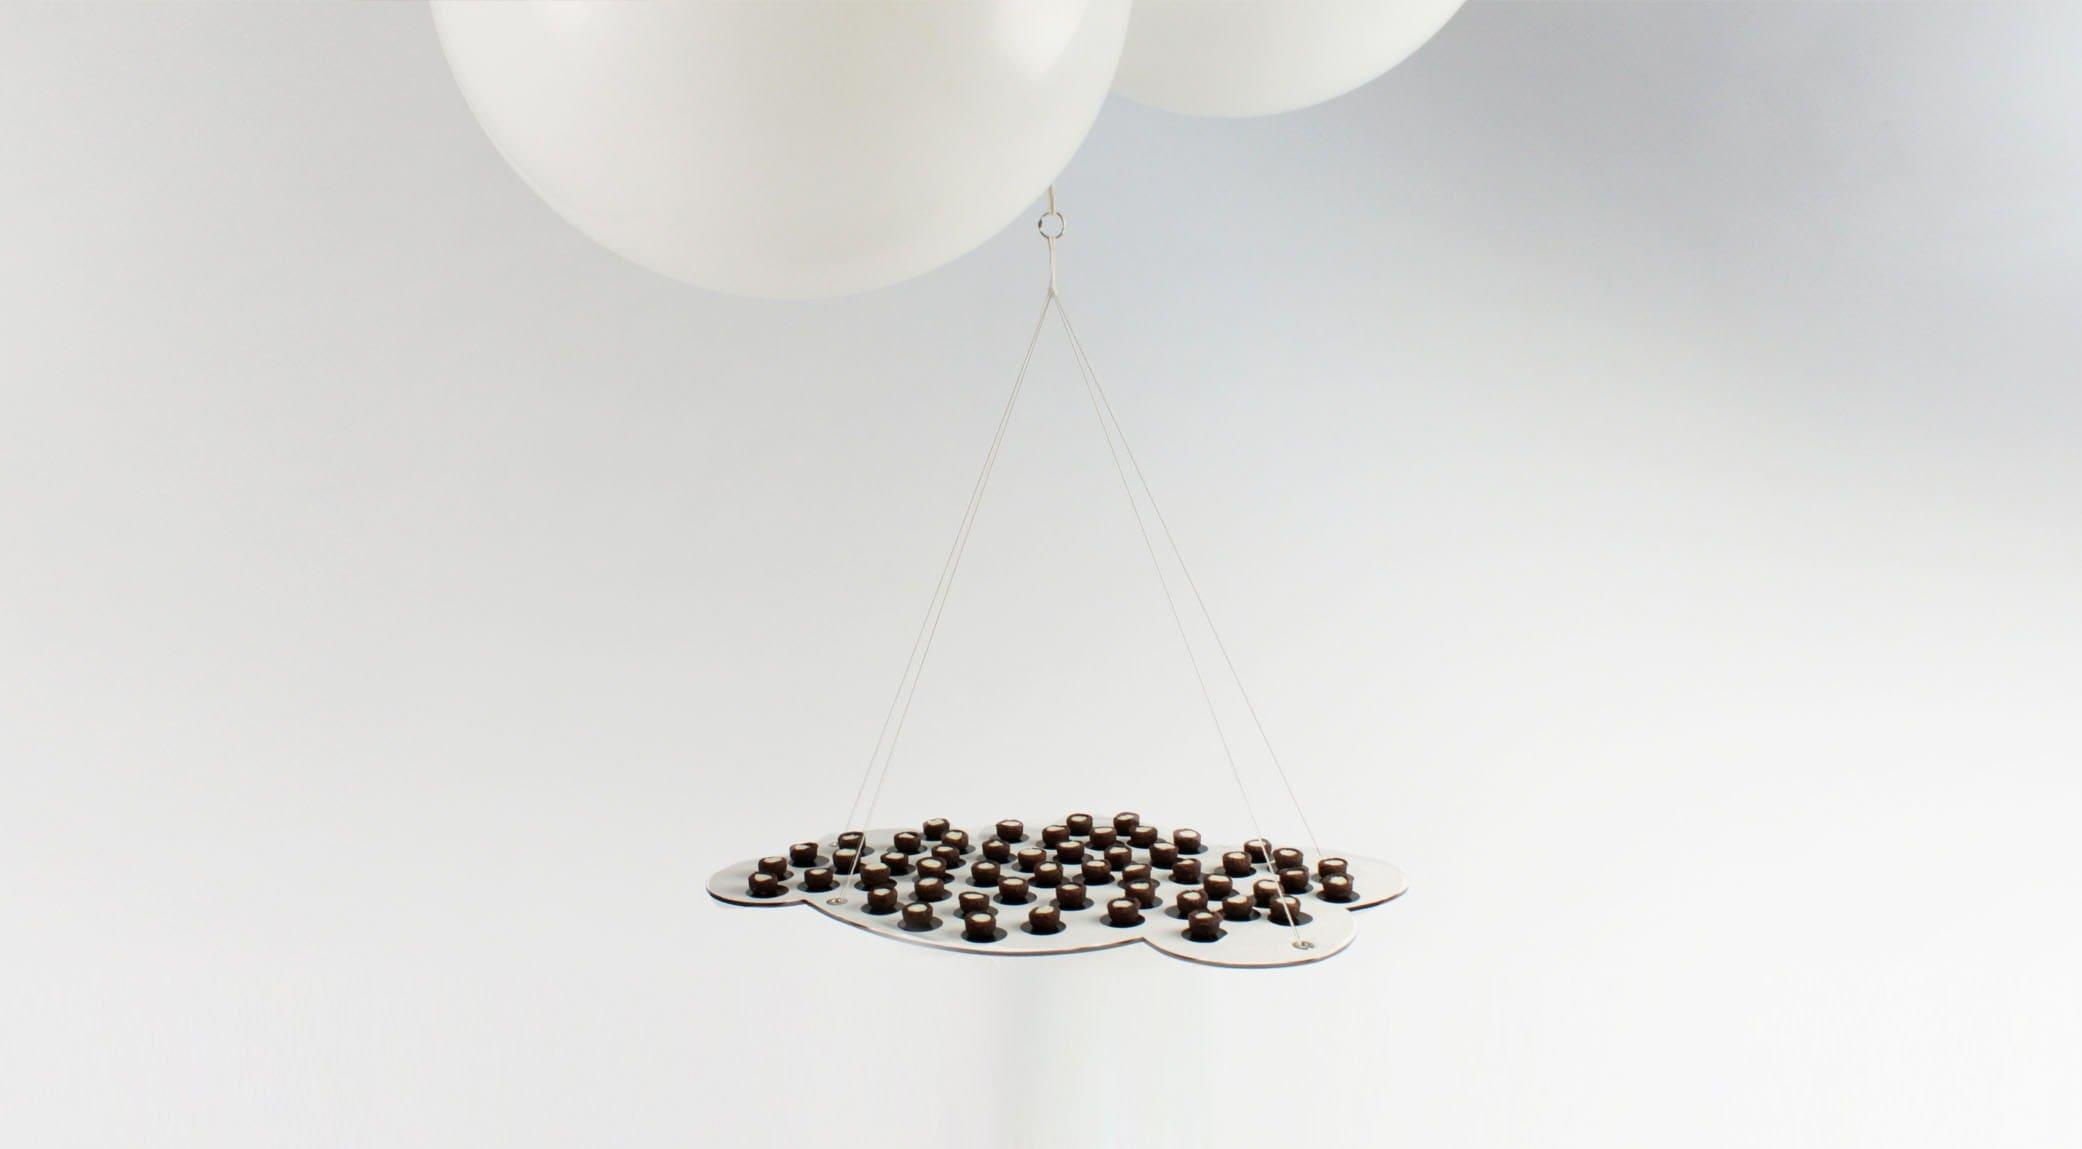 original_PopUp-Balloon-BrookiesandMilkPannacotta.jpg